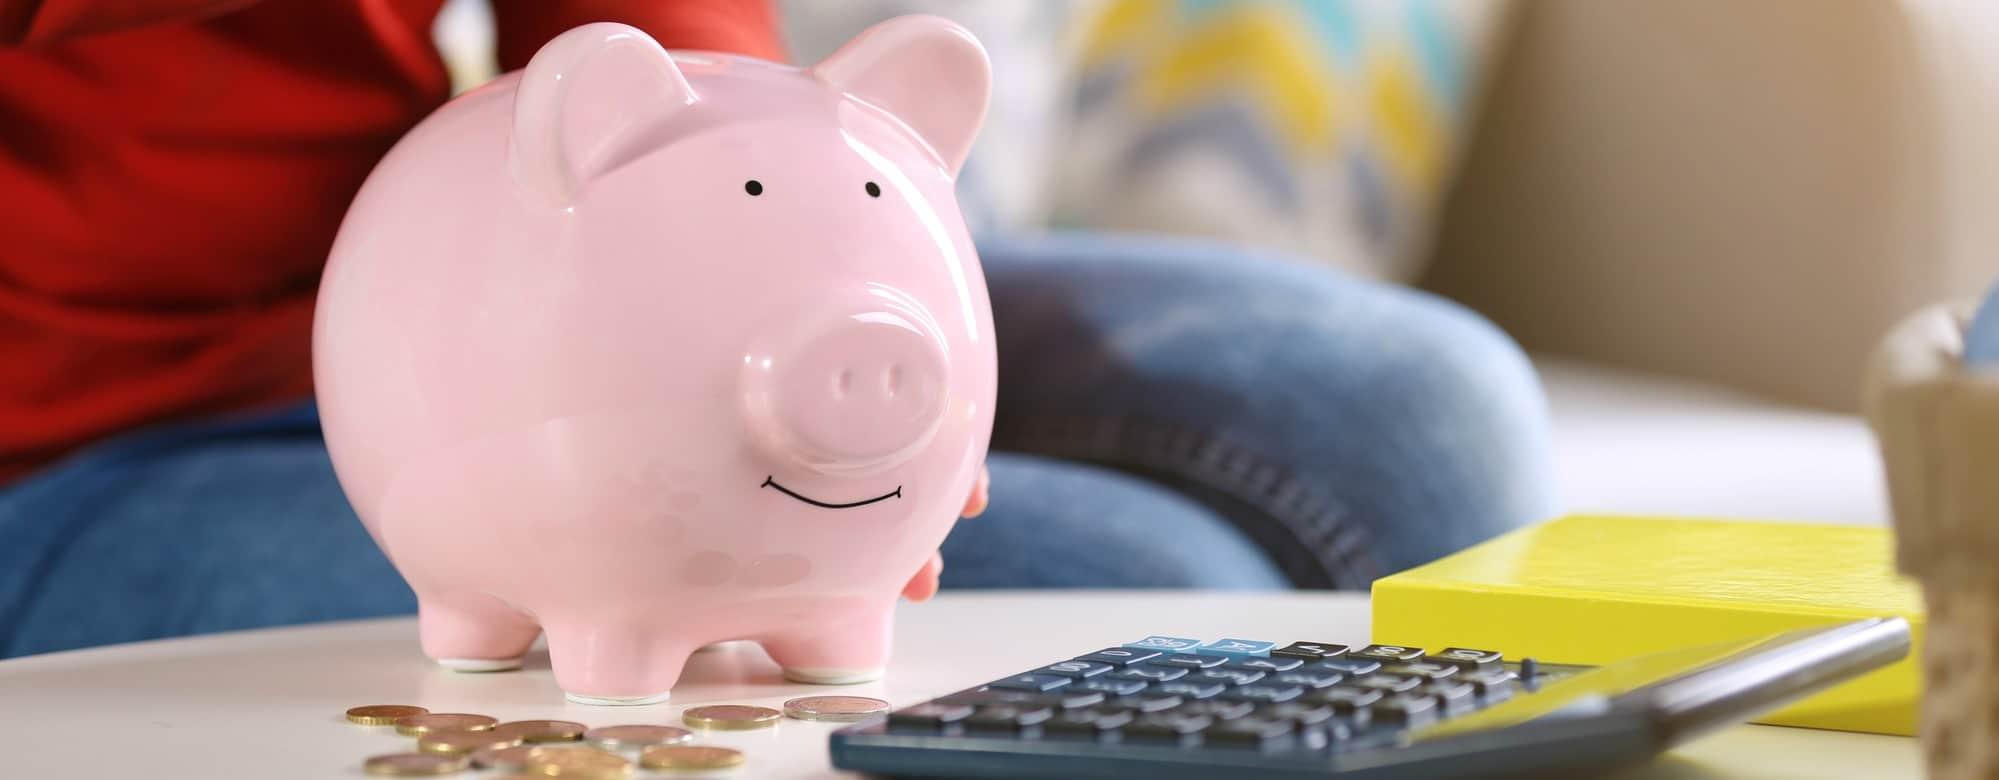 Female hand putting coins into piggy bank closeup